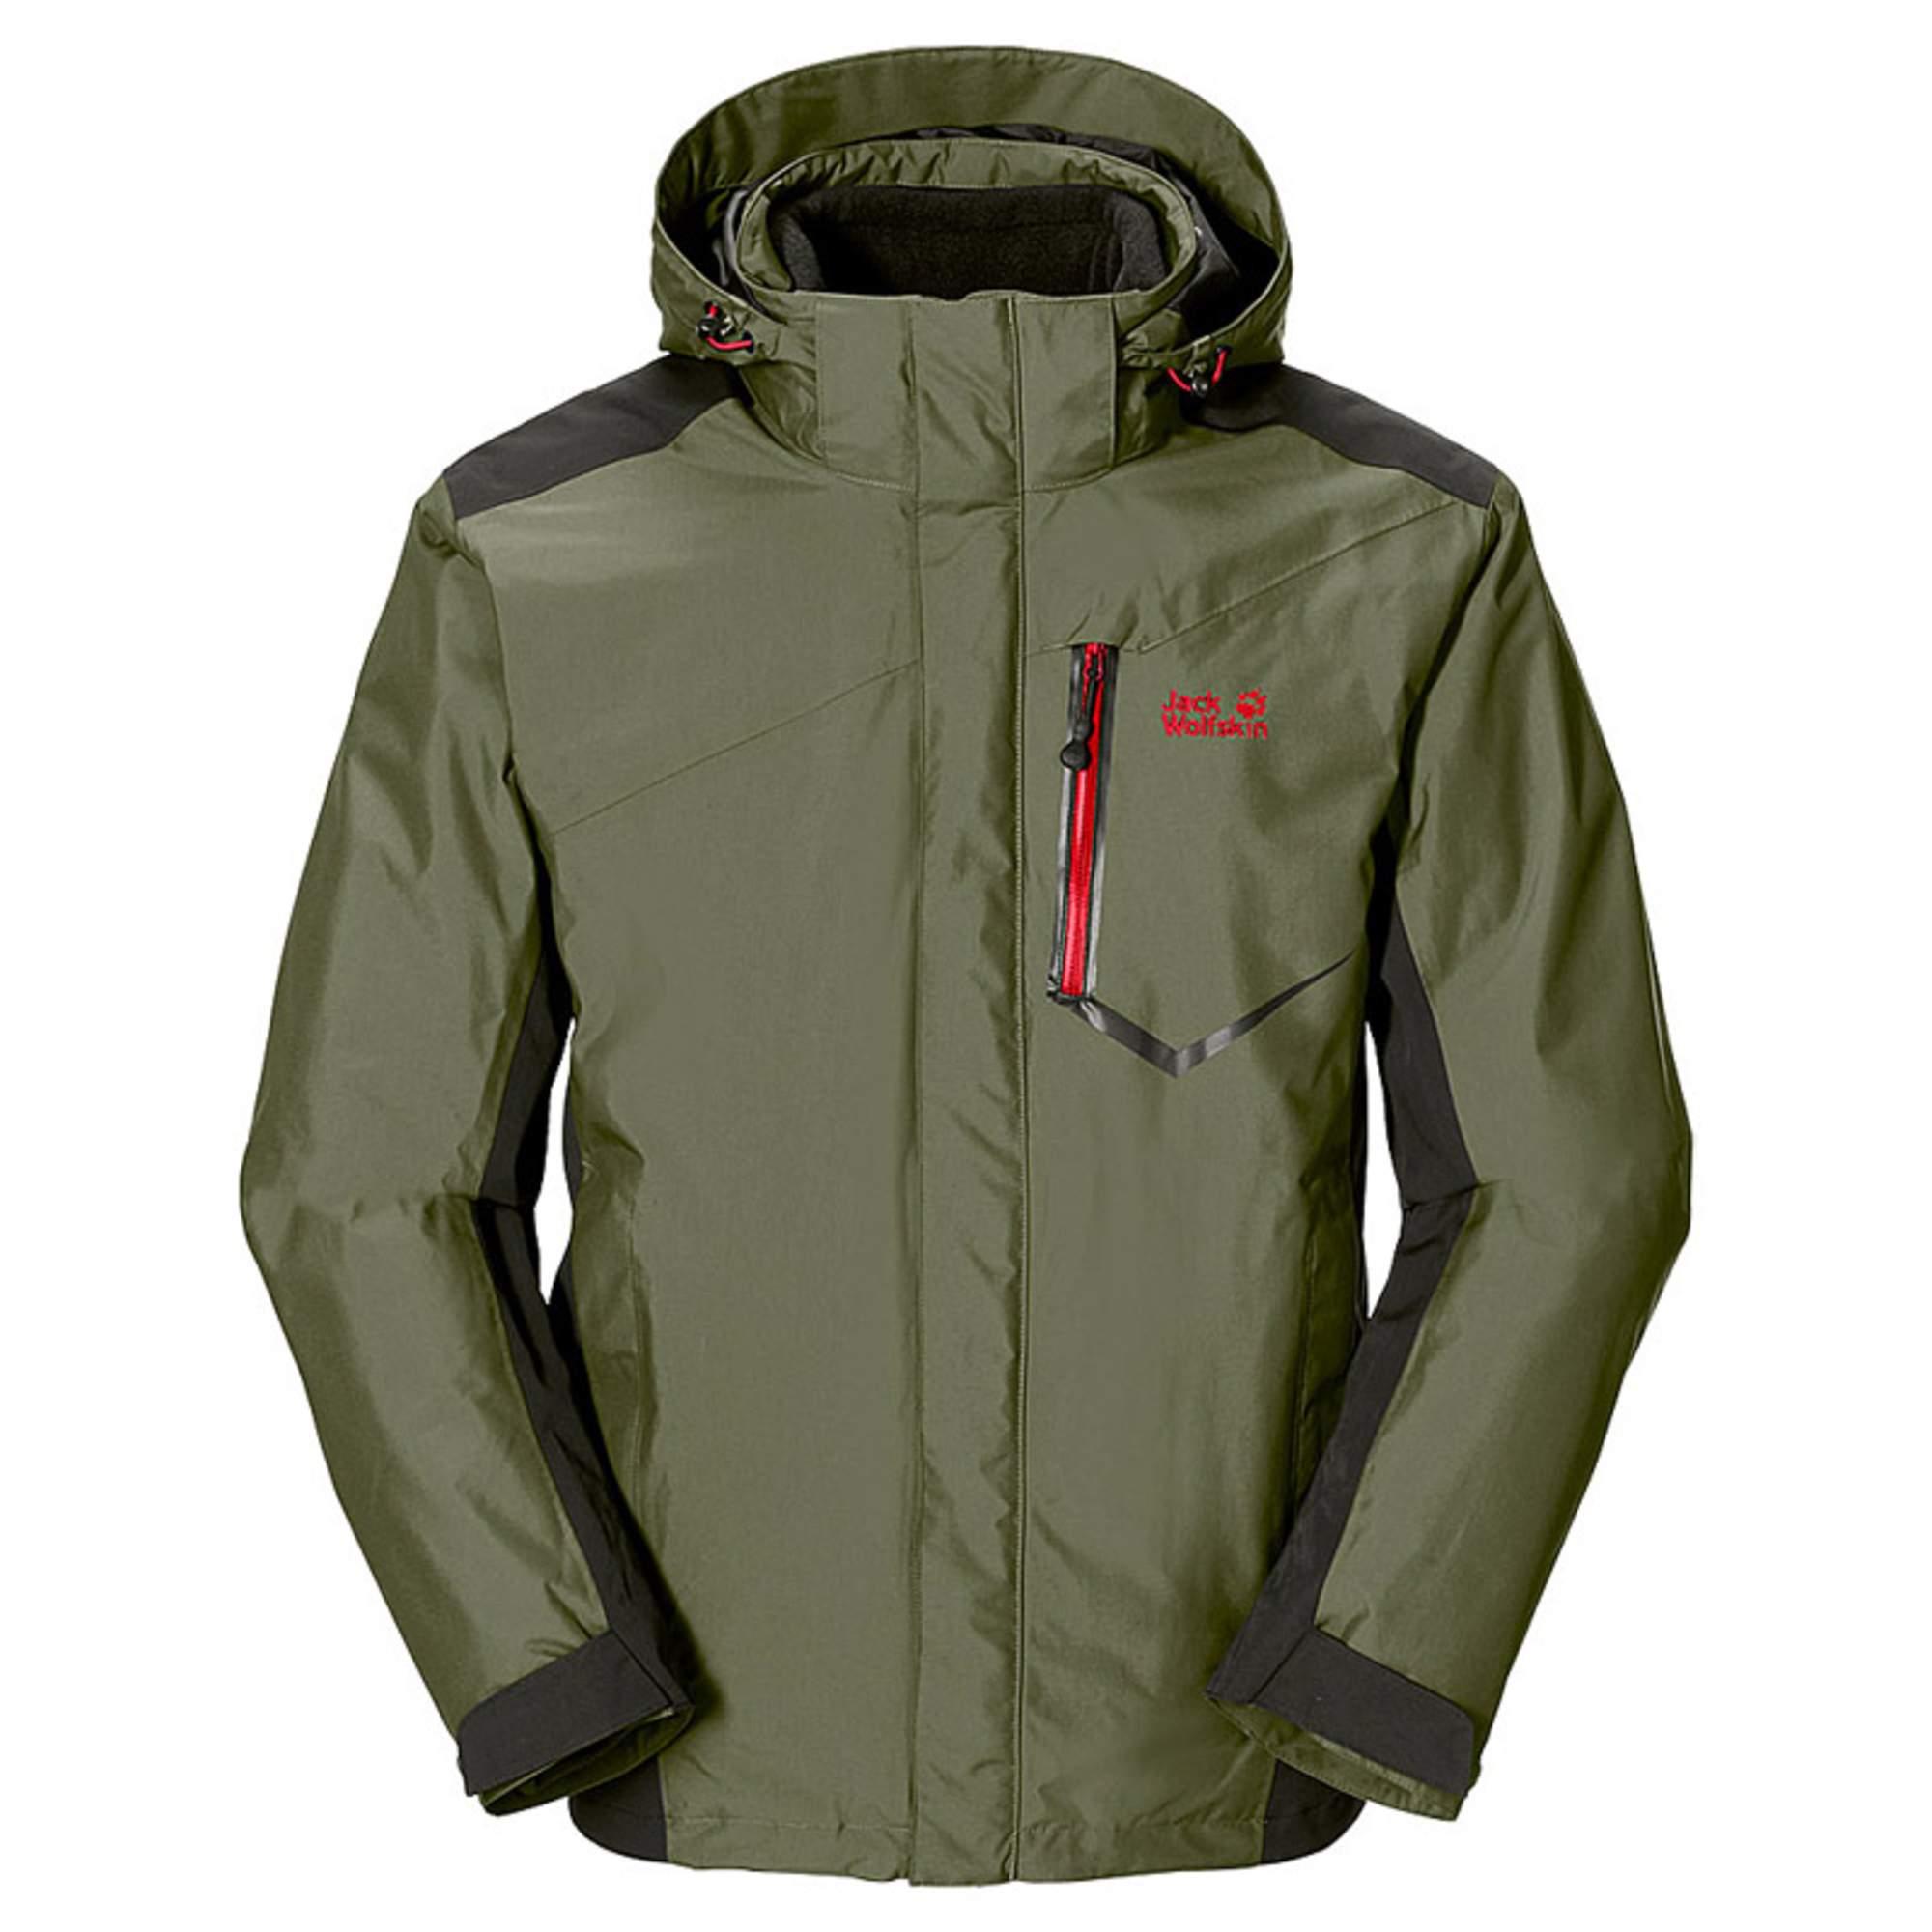 Jack wolfskin herren 3in1 jacke prisma jacket